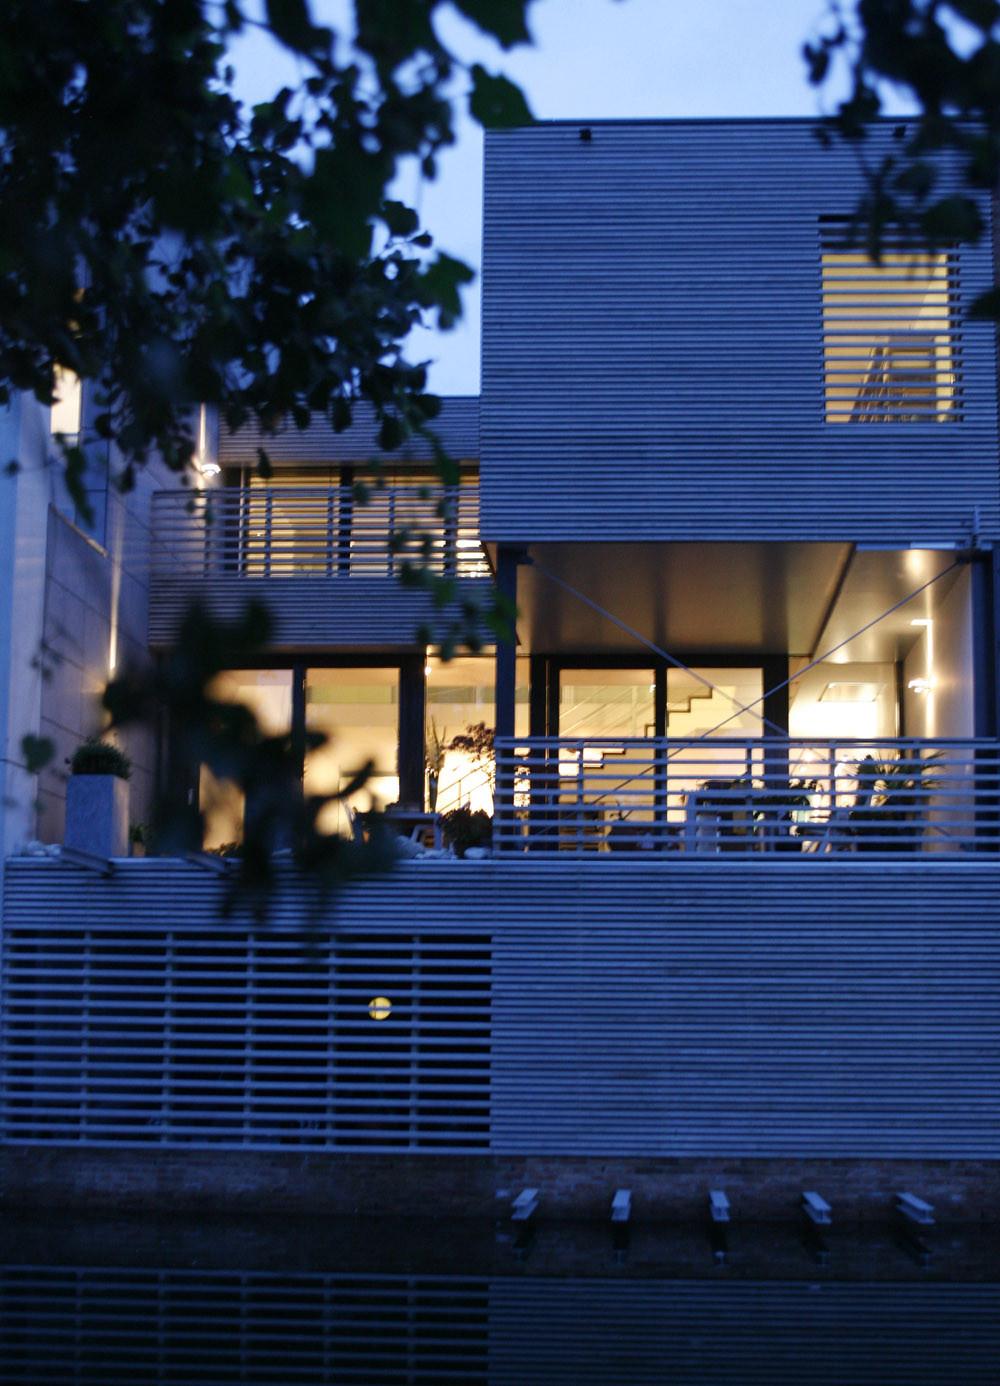 Quay-house / Inarchitecten